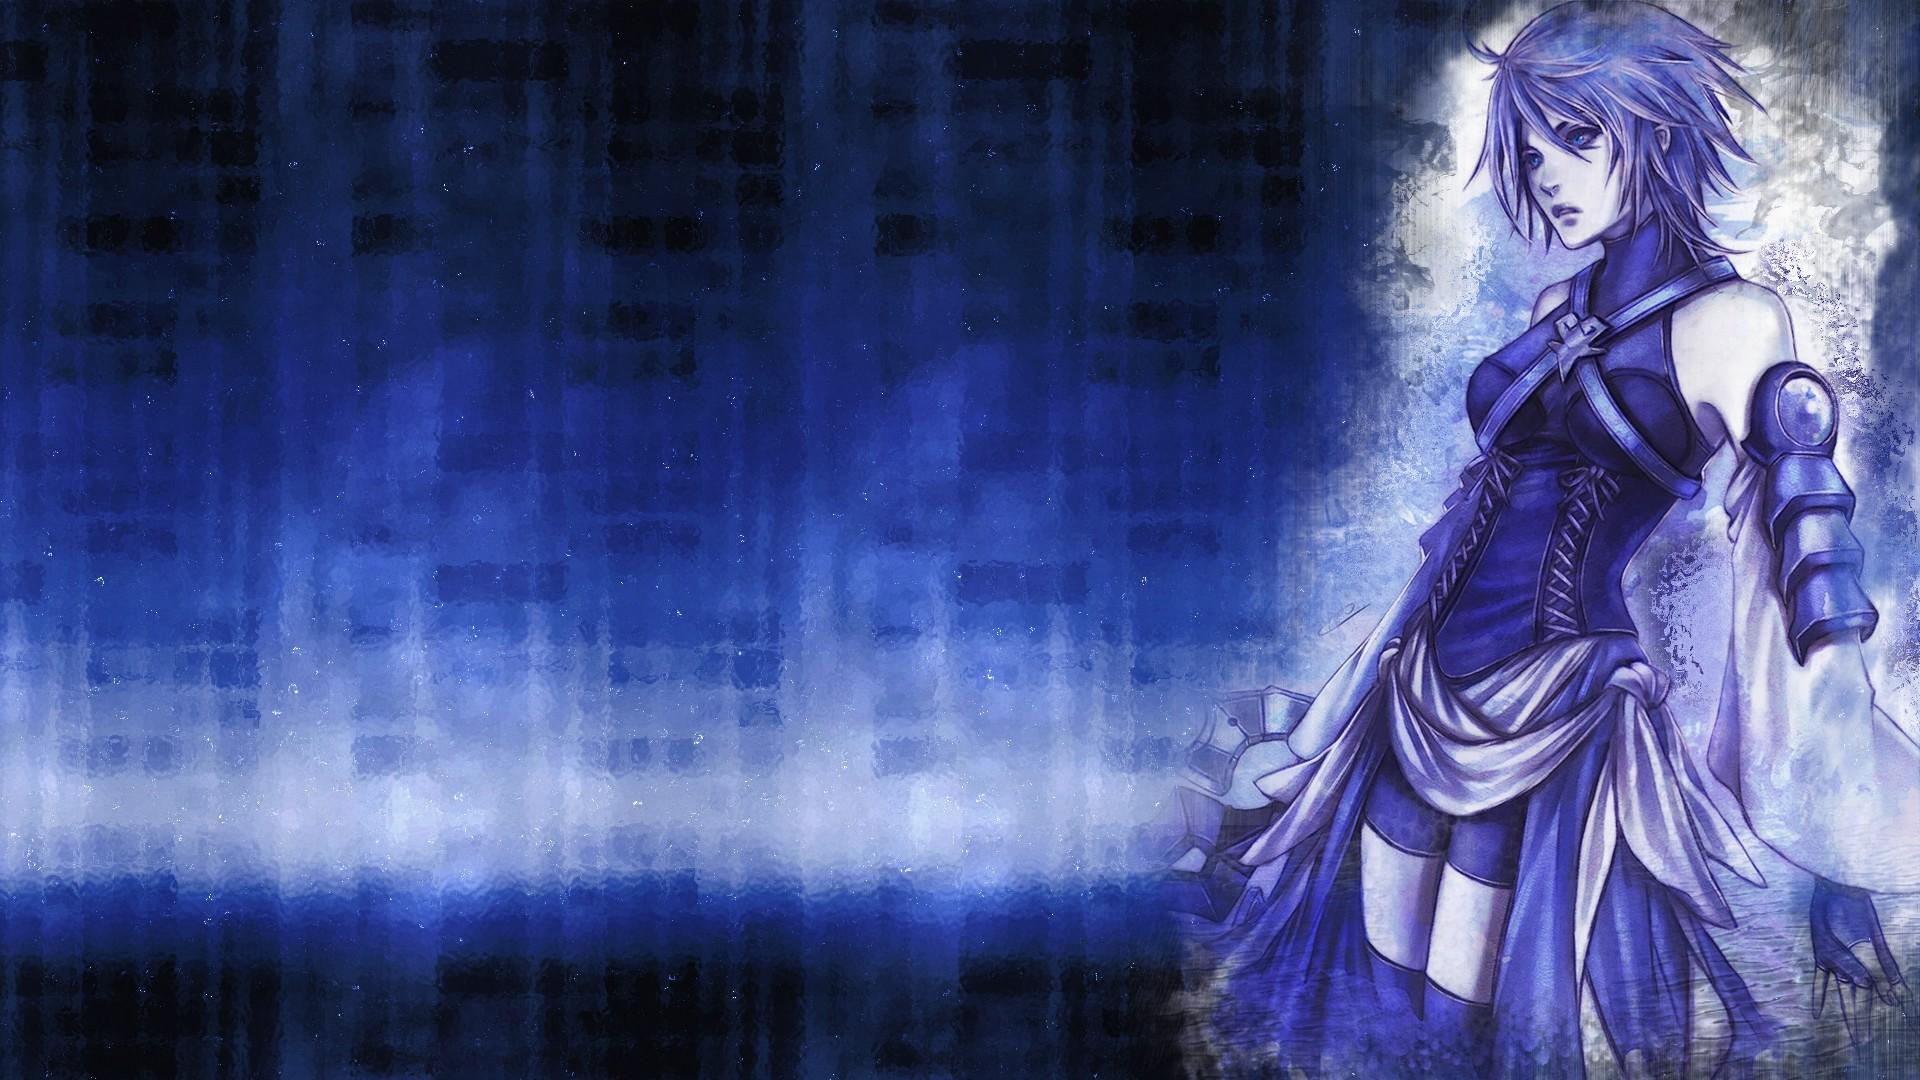 … download Kingdom Hearts: Birth by Sleep image